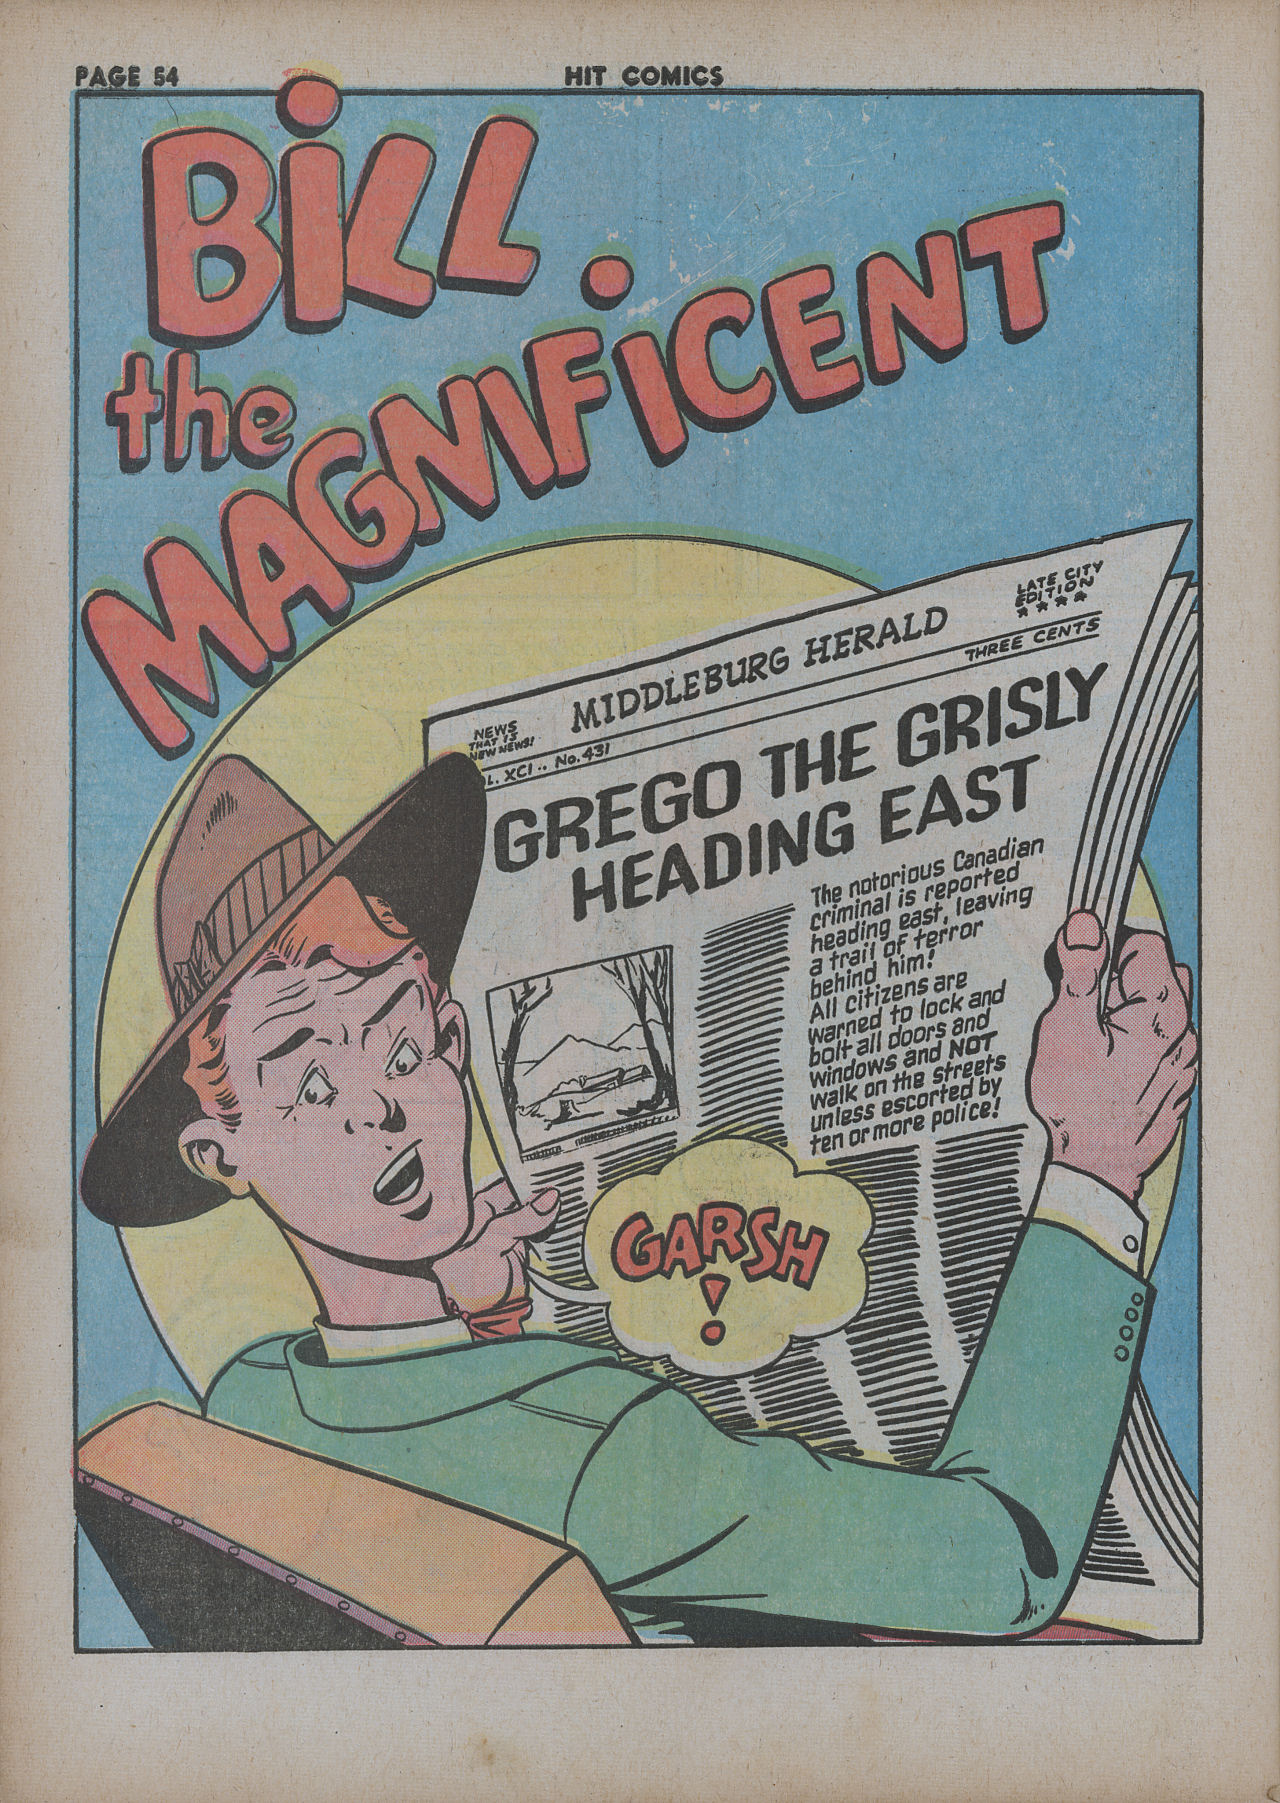 Read online Hit Comics comic -  Issue #27 - 56